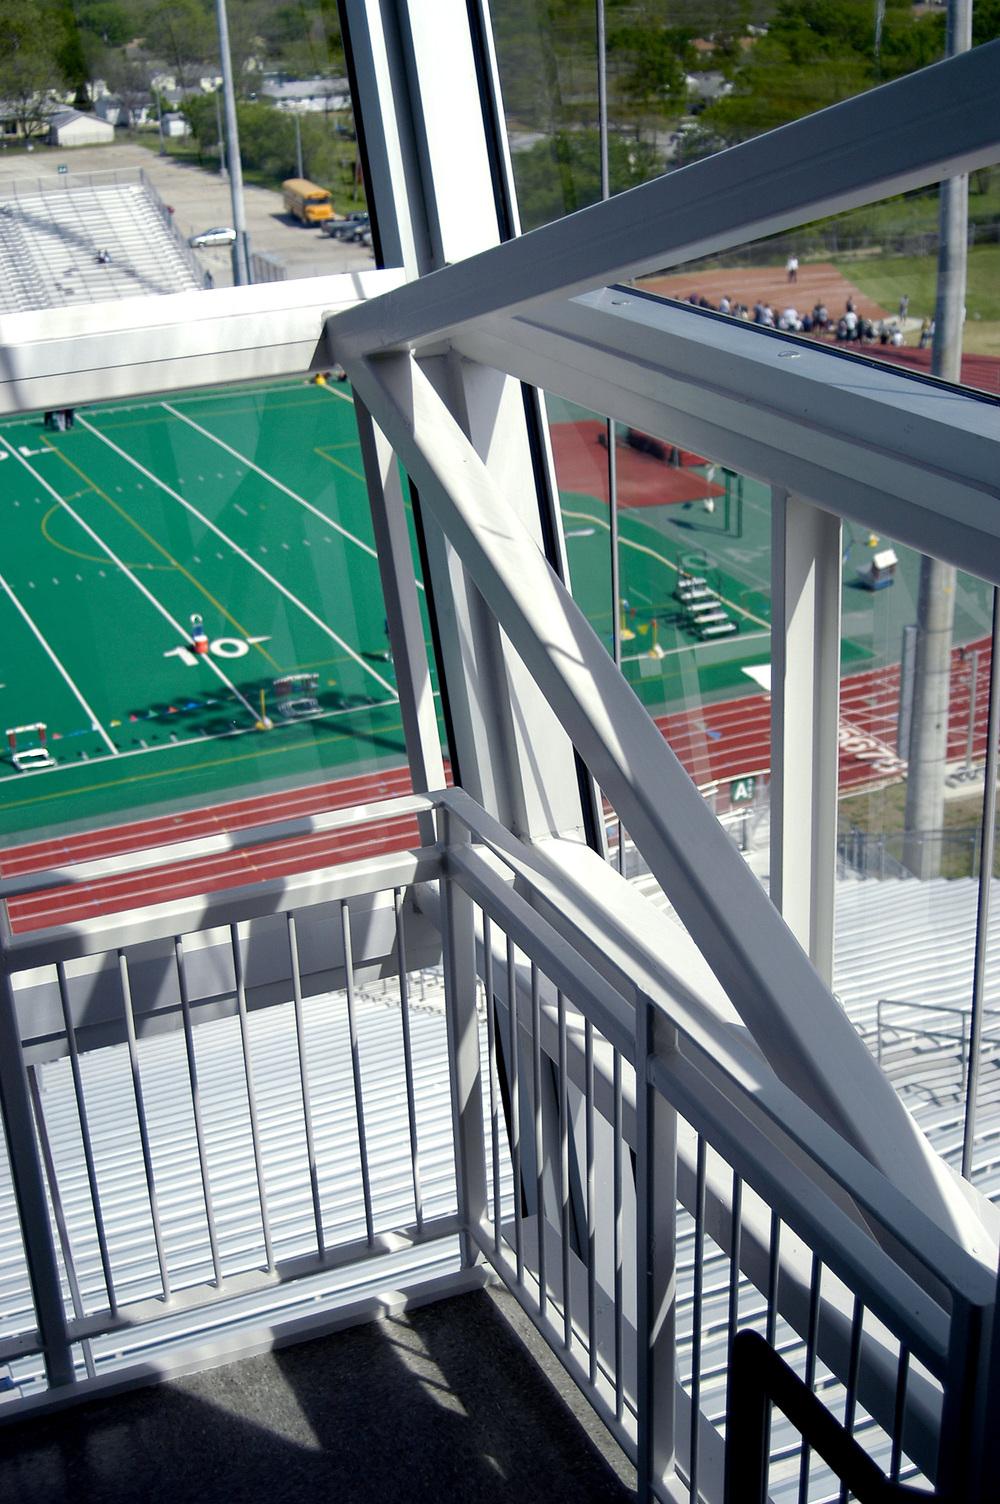 Hanby Stadium 04a ppt192.jpg